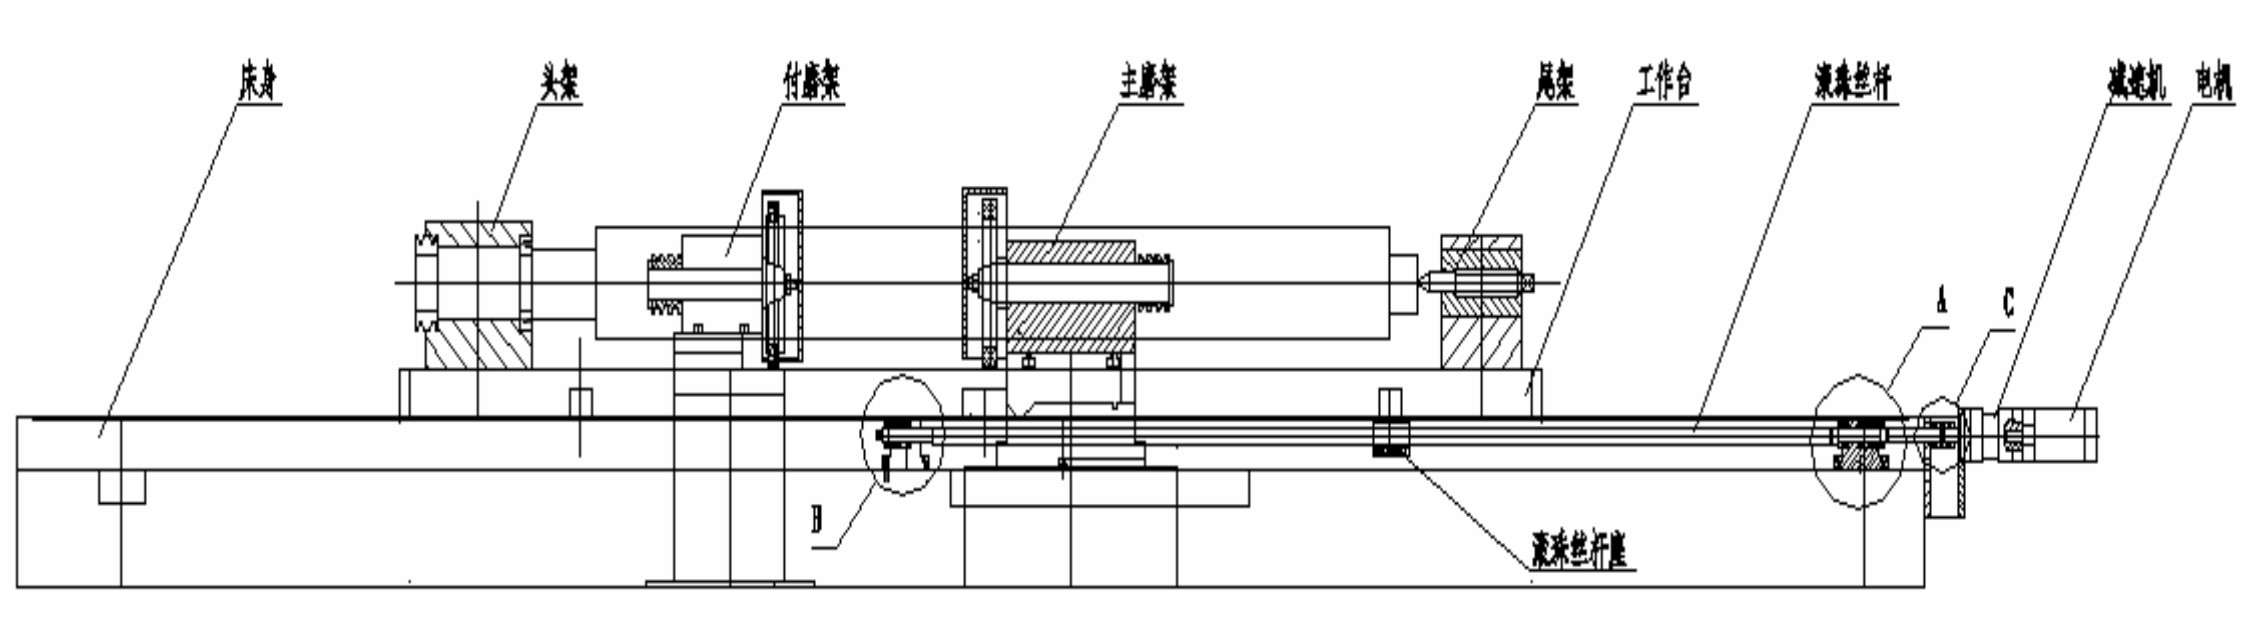 sl数控系统在h057磨床改造中的应用